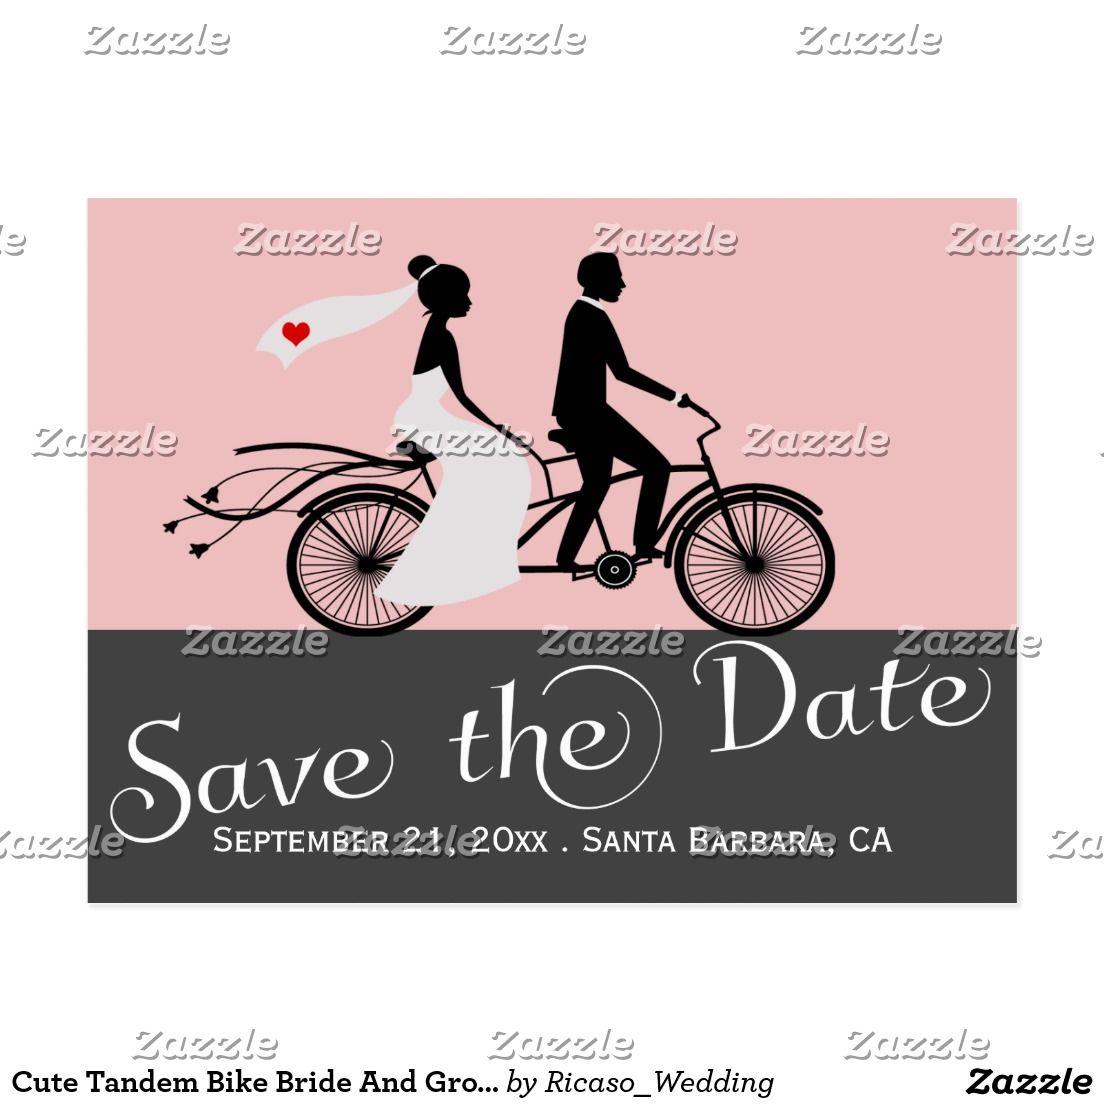 Cute Tandem Bike Bride And Groom Wedding Announcement Postcard ...